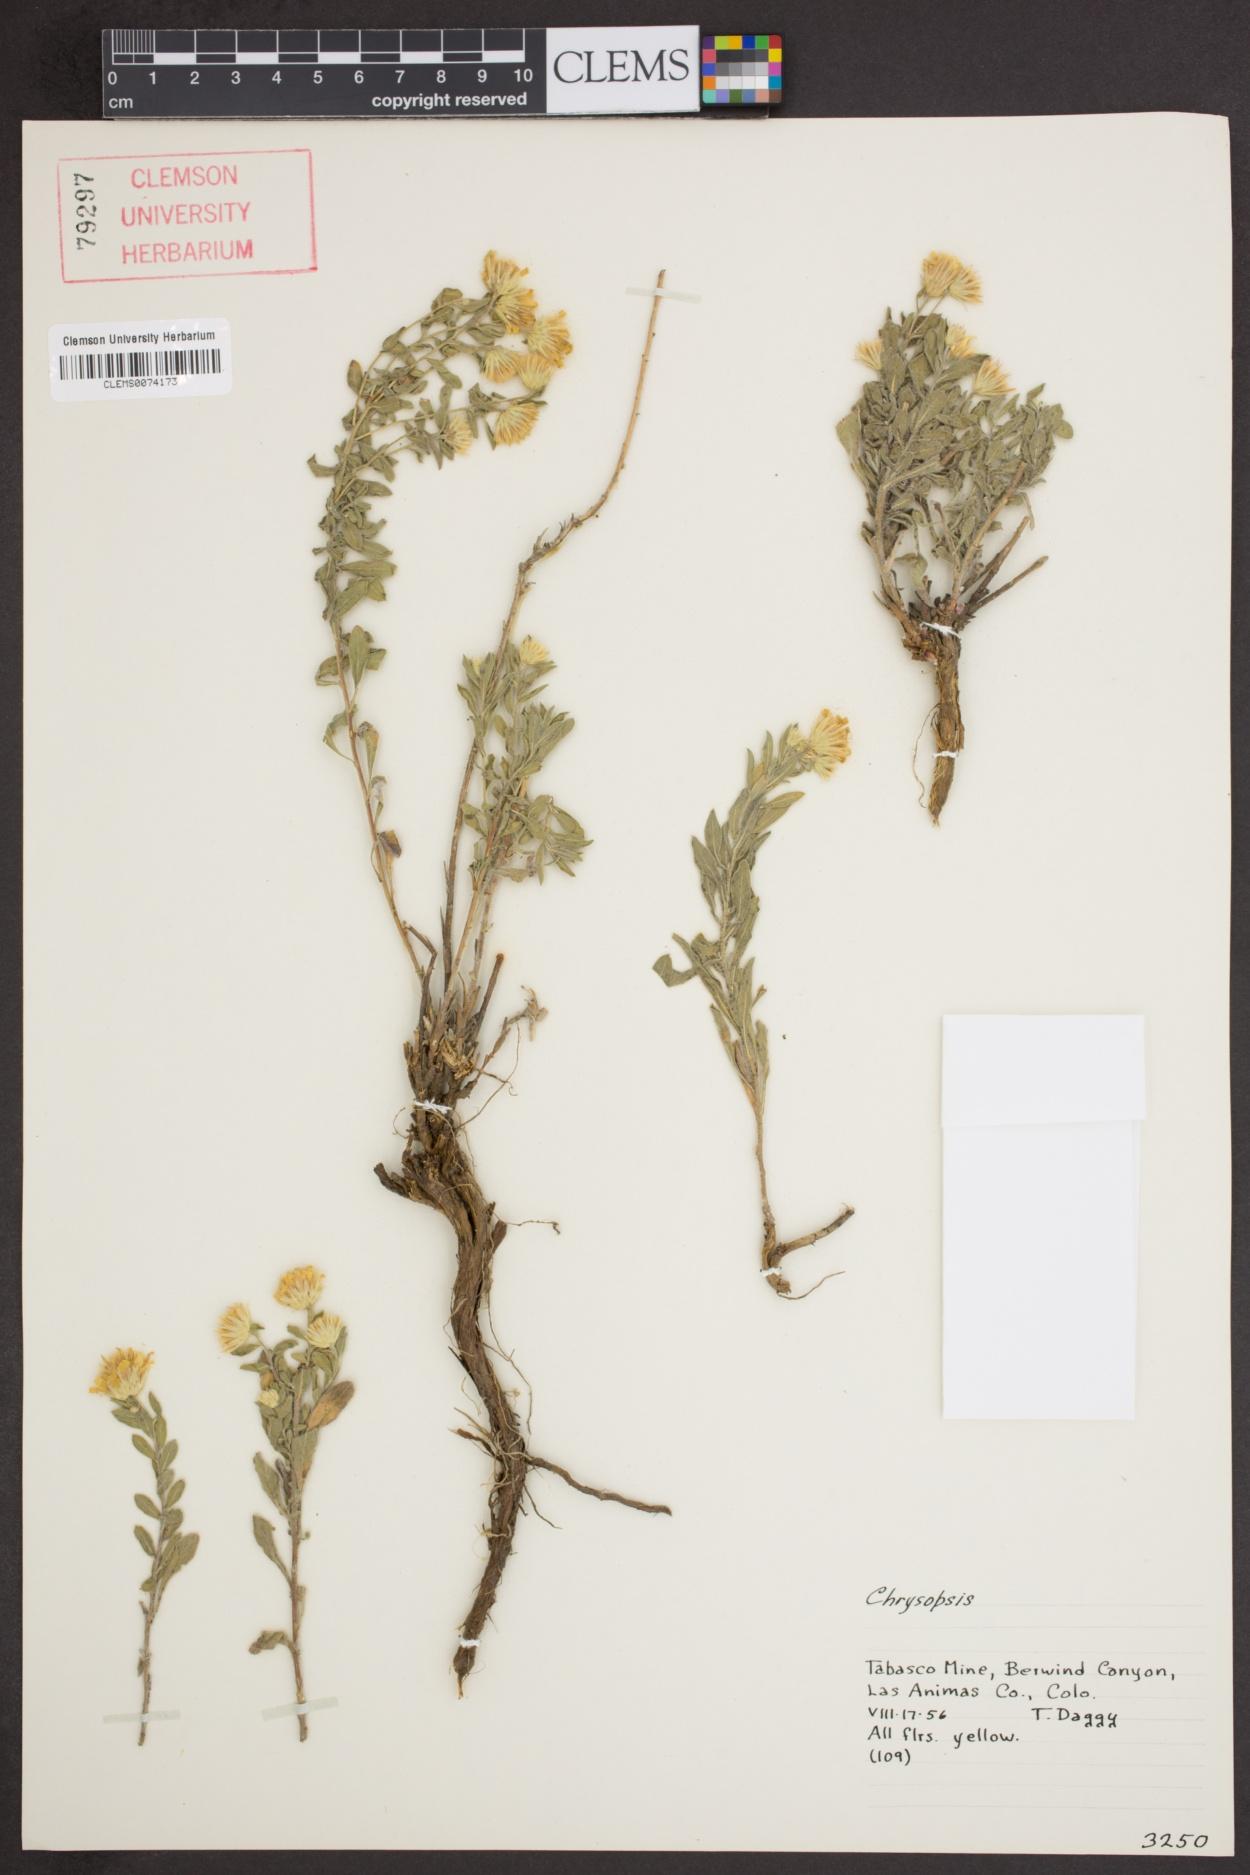 Chrysopsis image